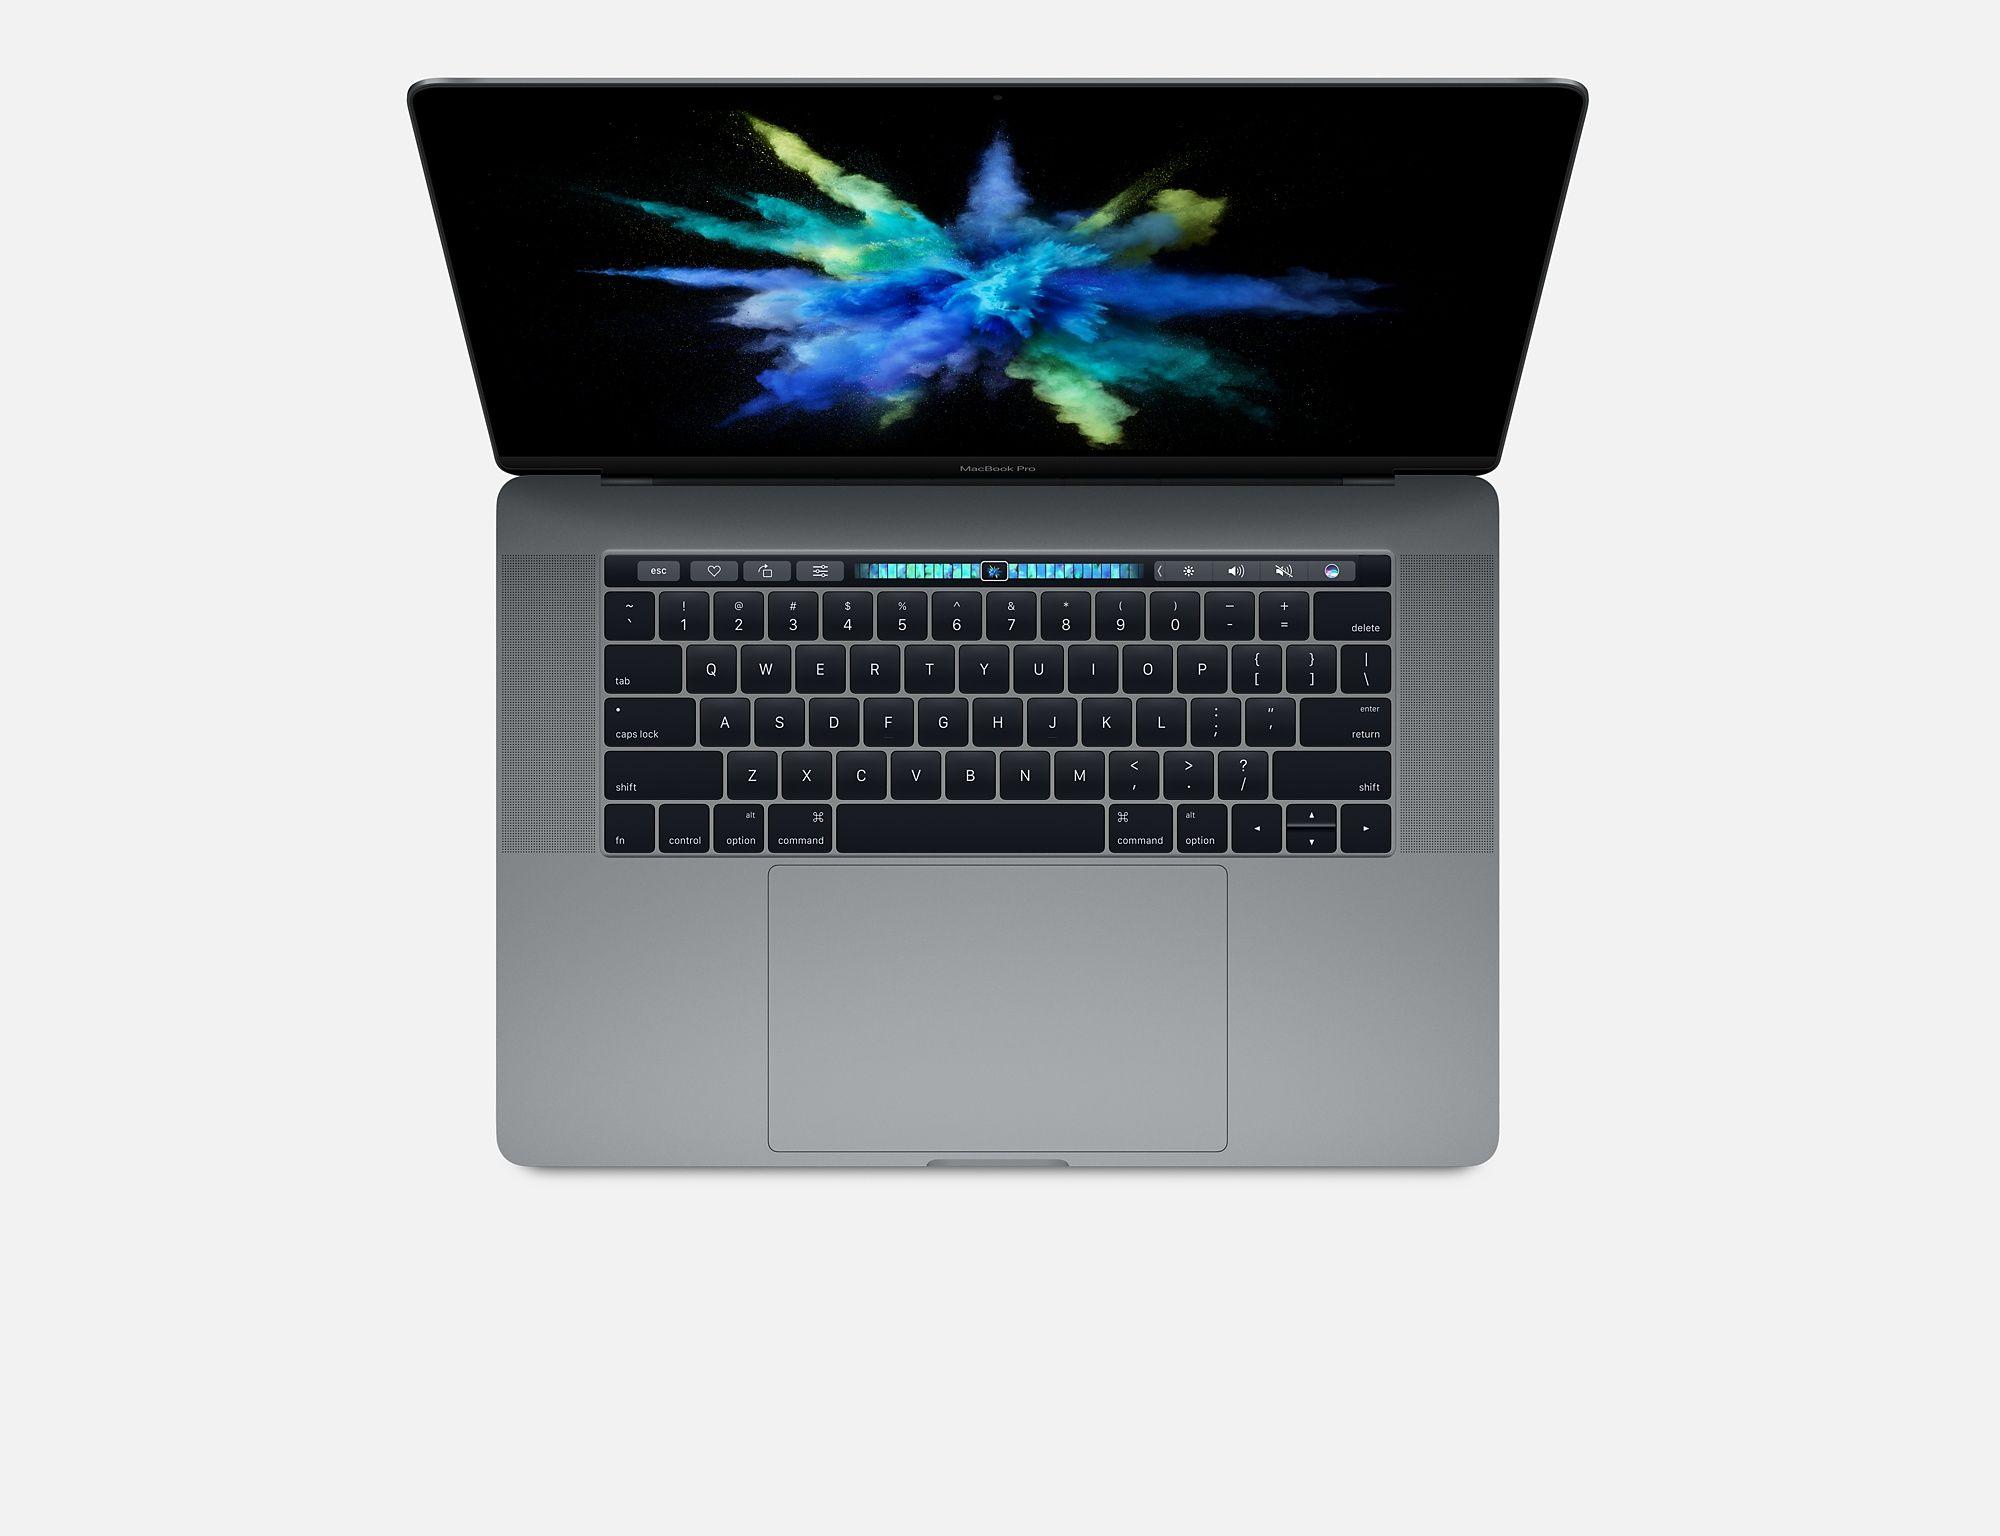 Buy Macbook Pro Cheap Macbook Pro Macbook Pro 15 Inch Cheap Macbook